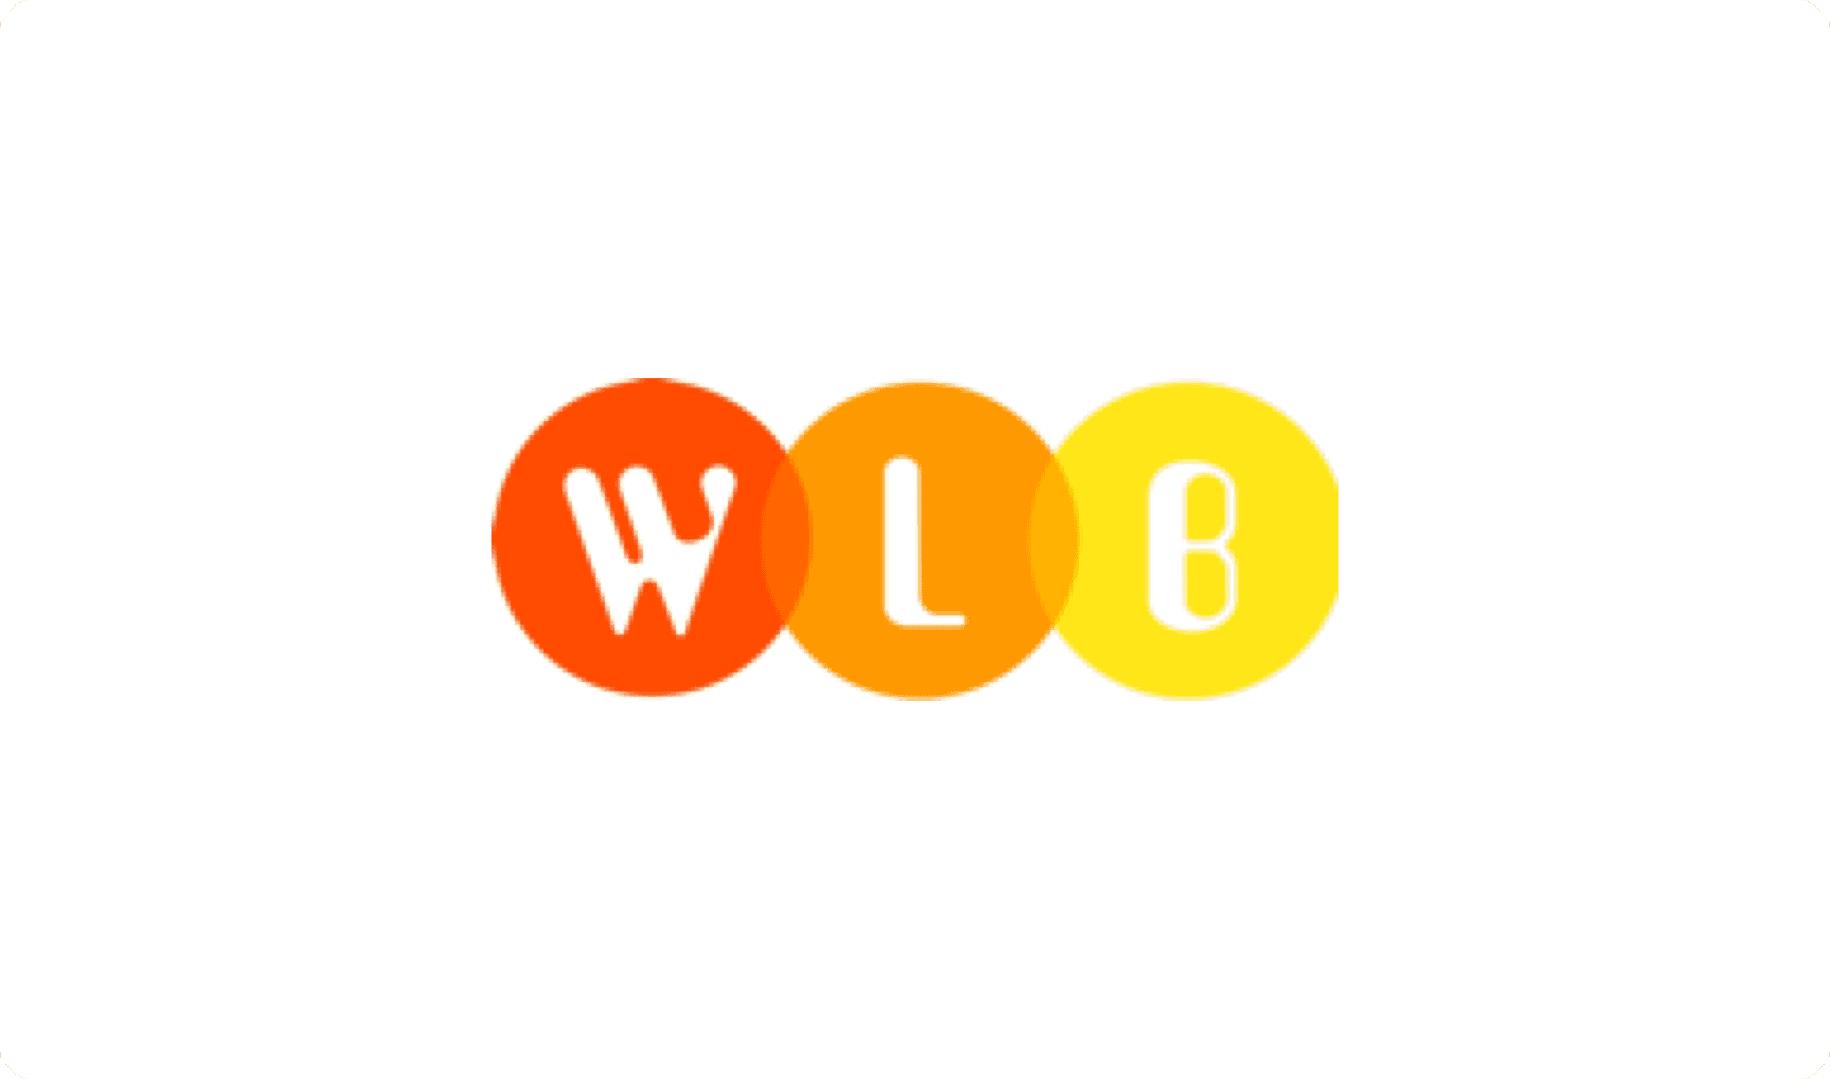 WORK LIFE BALANCE Co., Ltd.